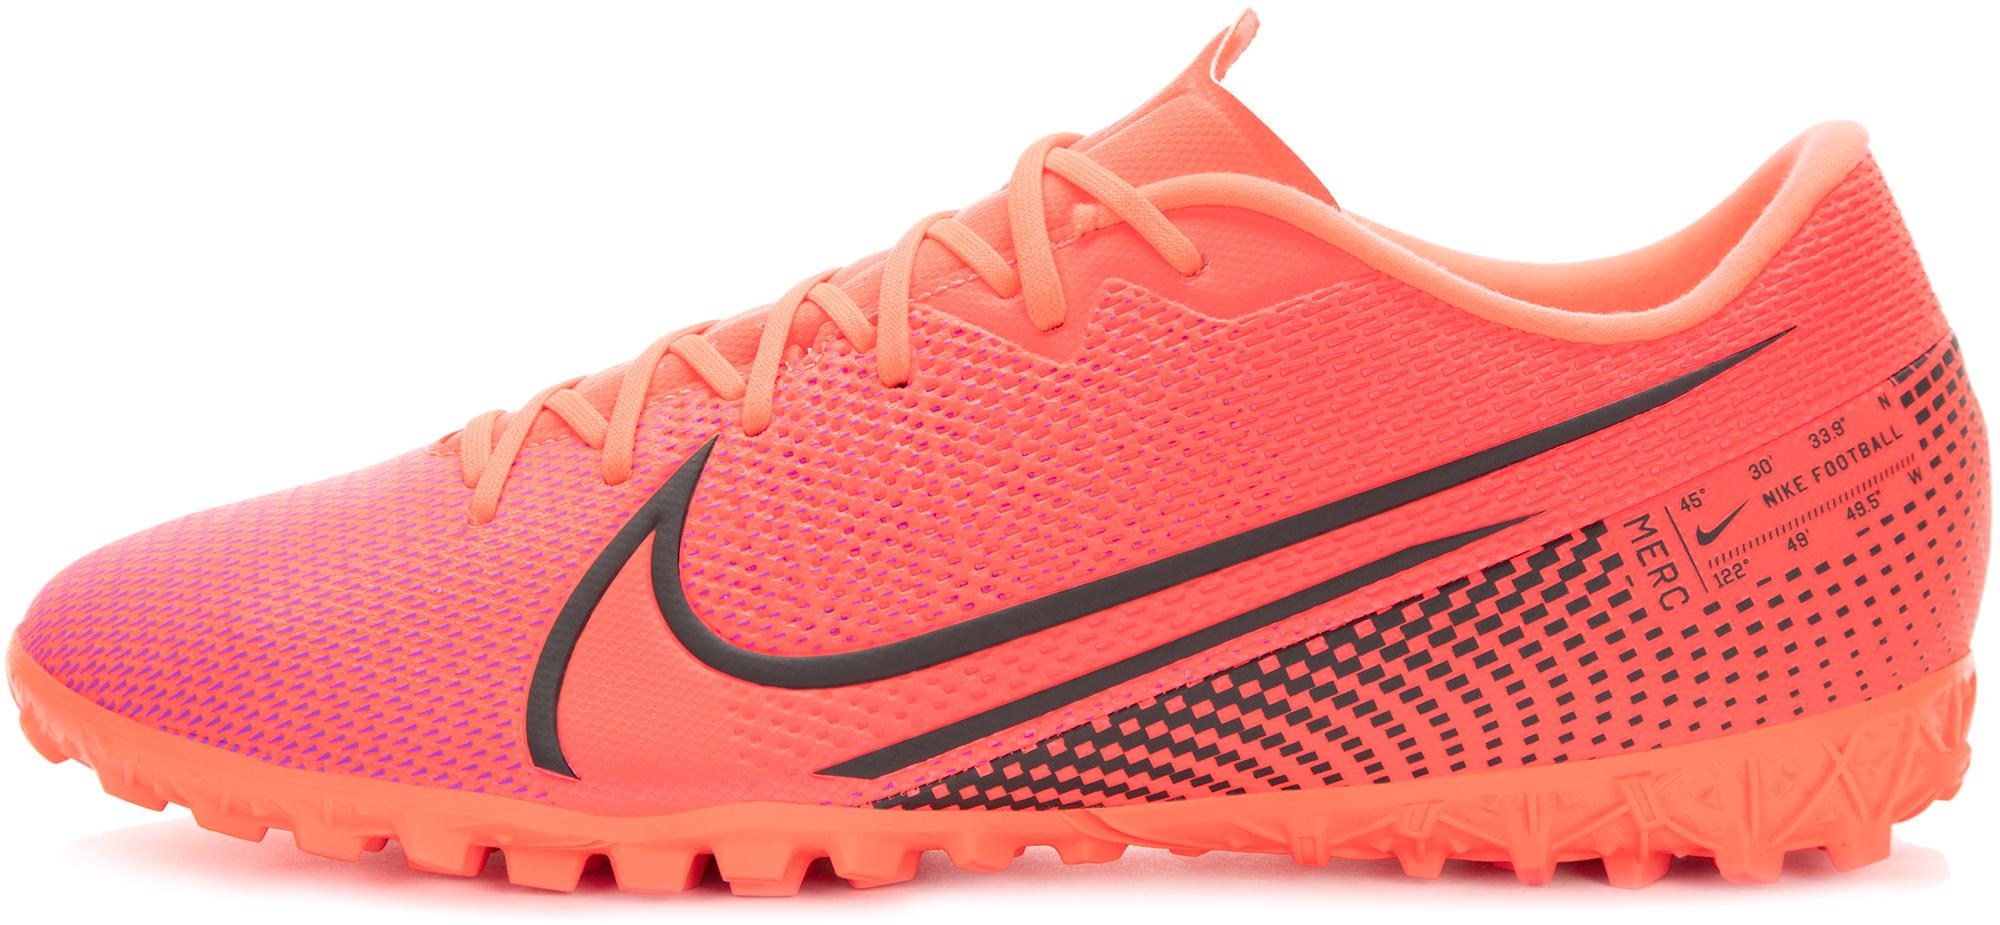 Nike Бутсы мужские Nike Vapor 13 Academy Tf, размер 43,5 nike бутсы мужские nike nike bravatax ii tf